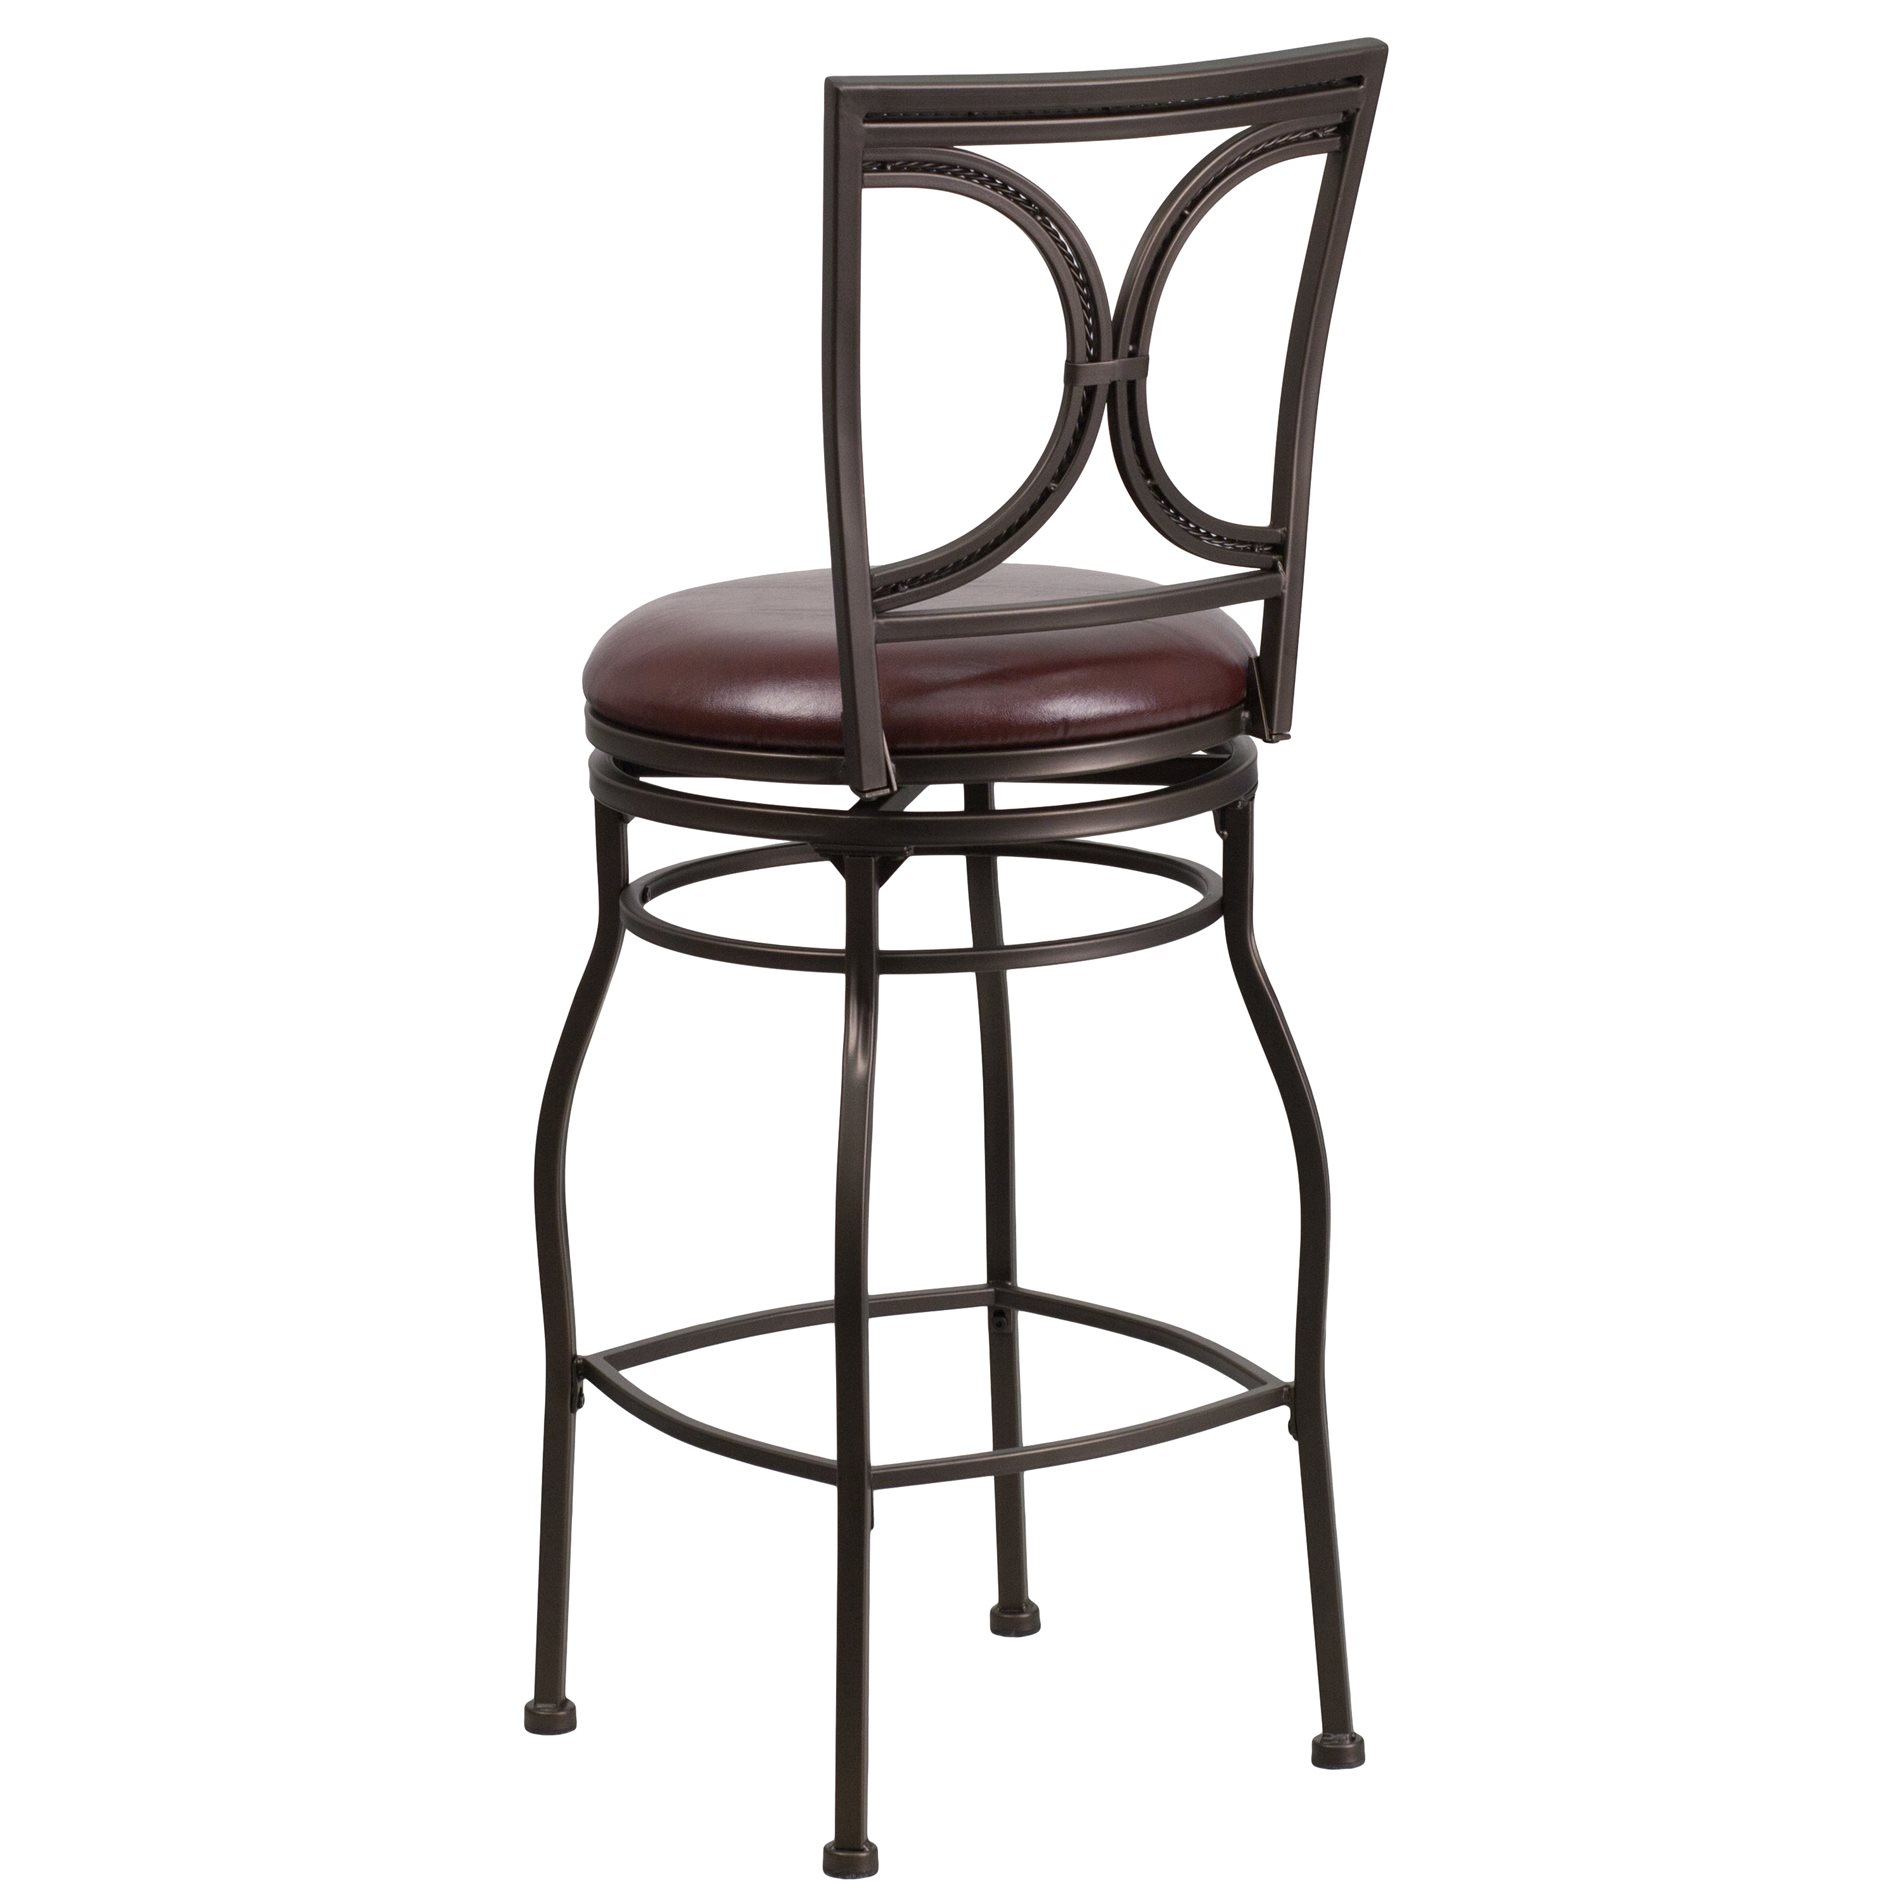 Flash Furniture BS 6023 29 BN GG Barstools Metal